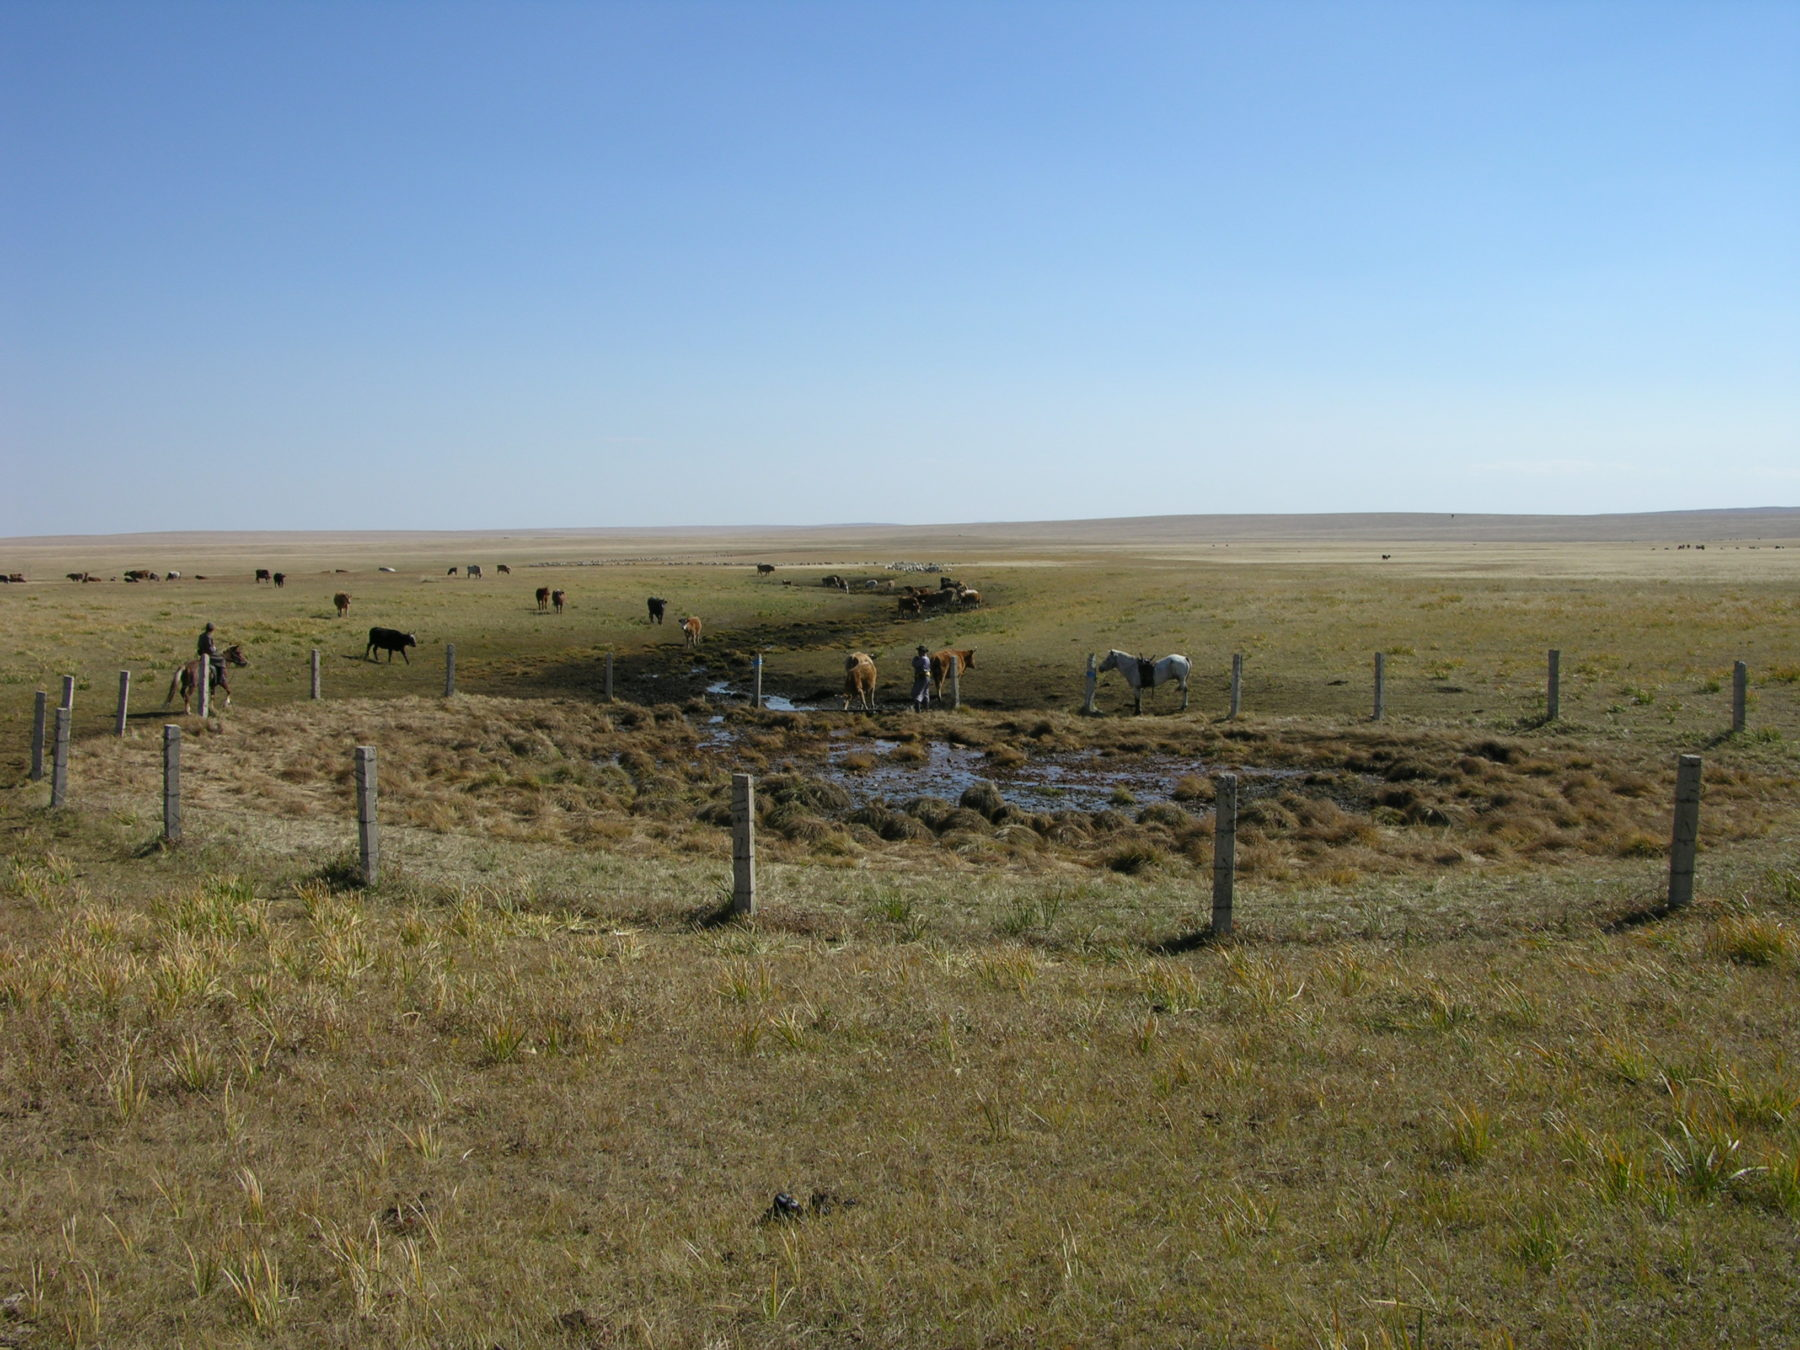 https://www.thethirdpole.net/content/uploads/2021/06/Landscapes-of-Dauria-Blue-Horse-10-scaled.jpg